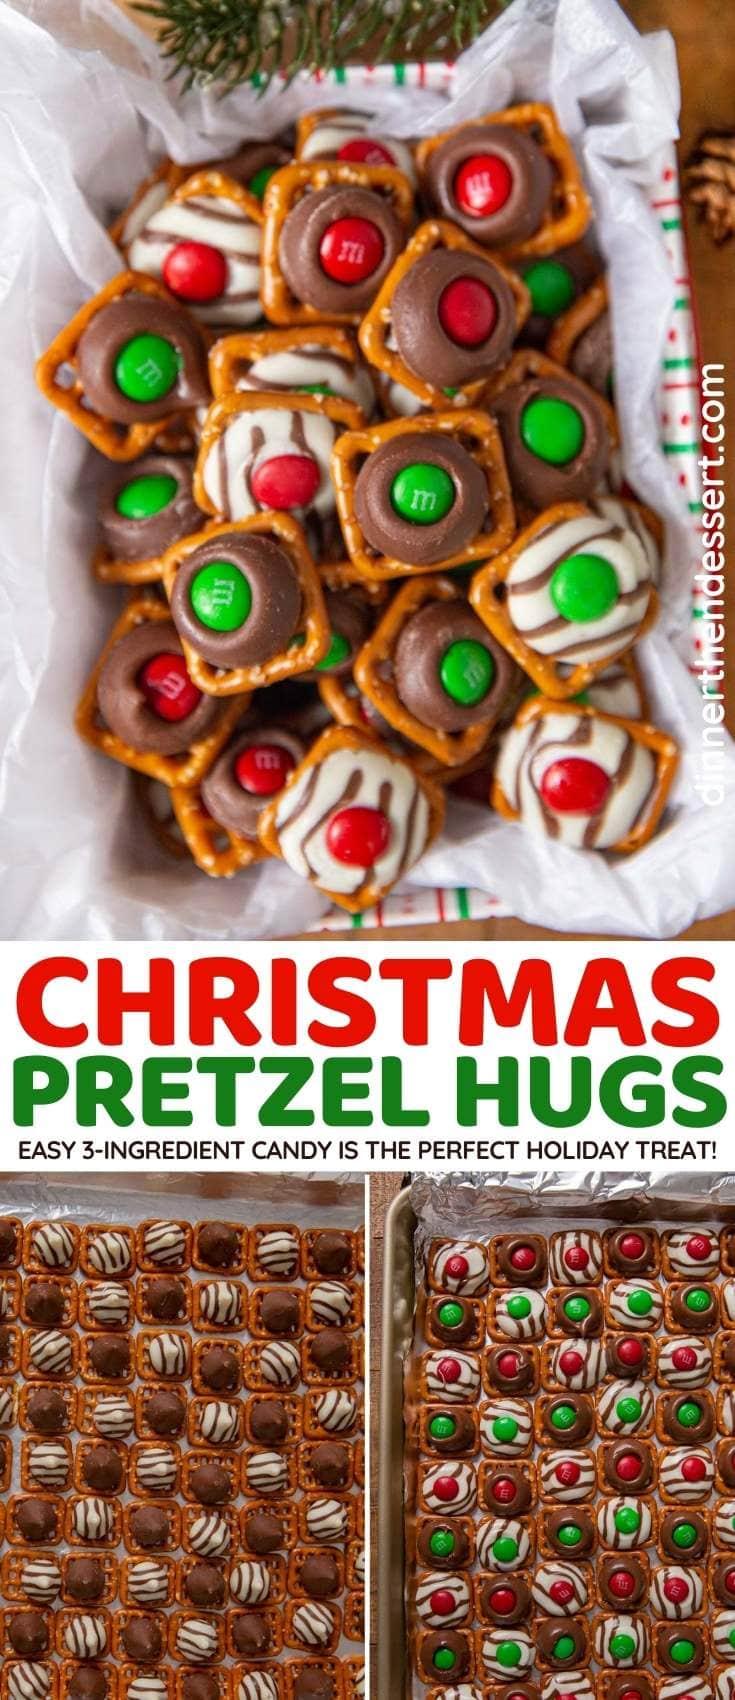 Christmas Pretzel Hugs collage